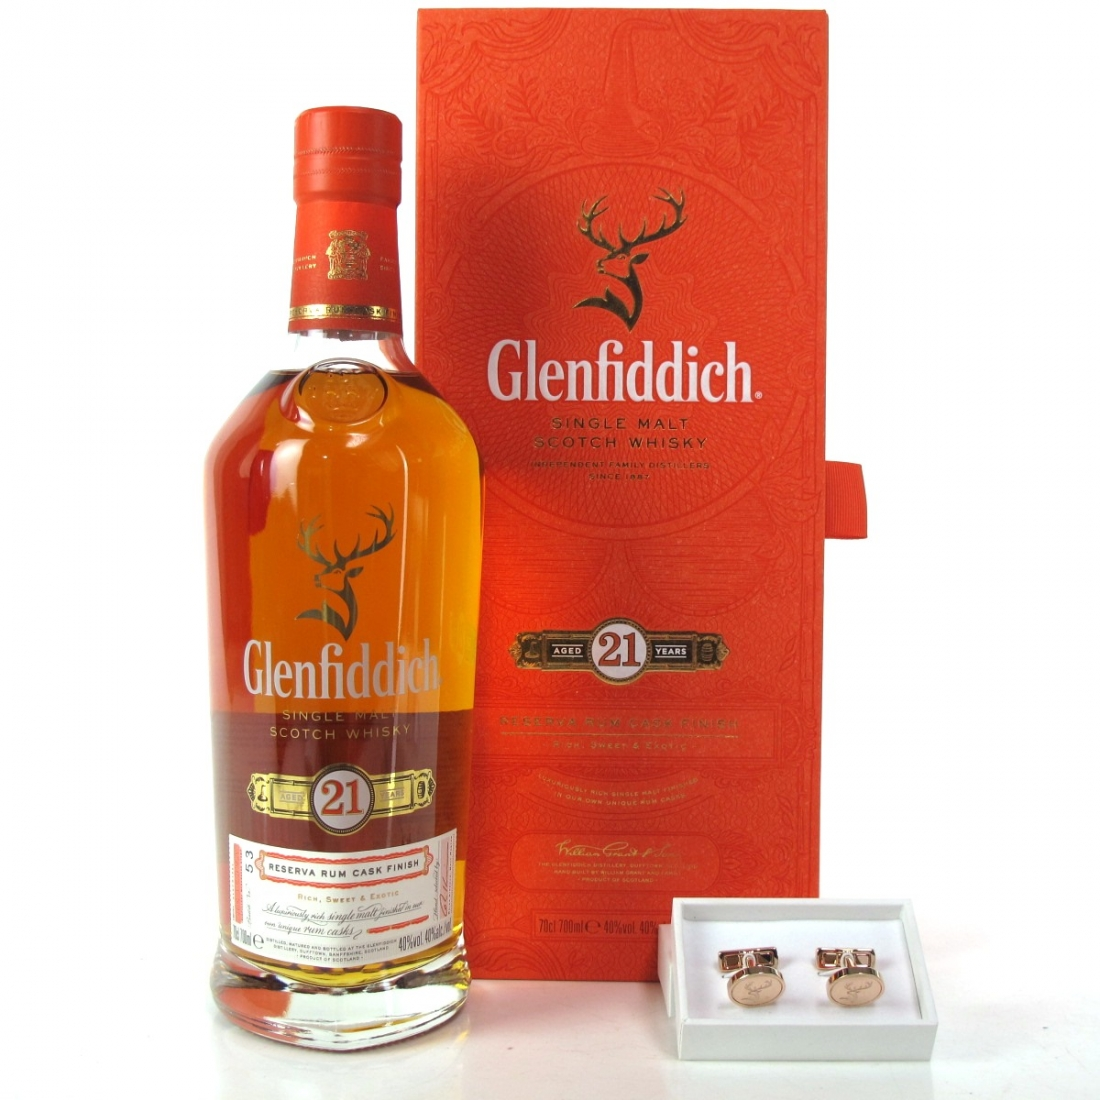 Glenfiddich 21 Year Old Reserva Rum Finish / Including Cufflinks